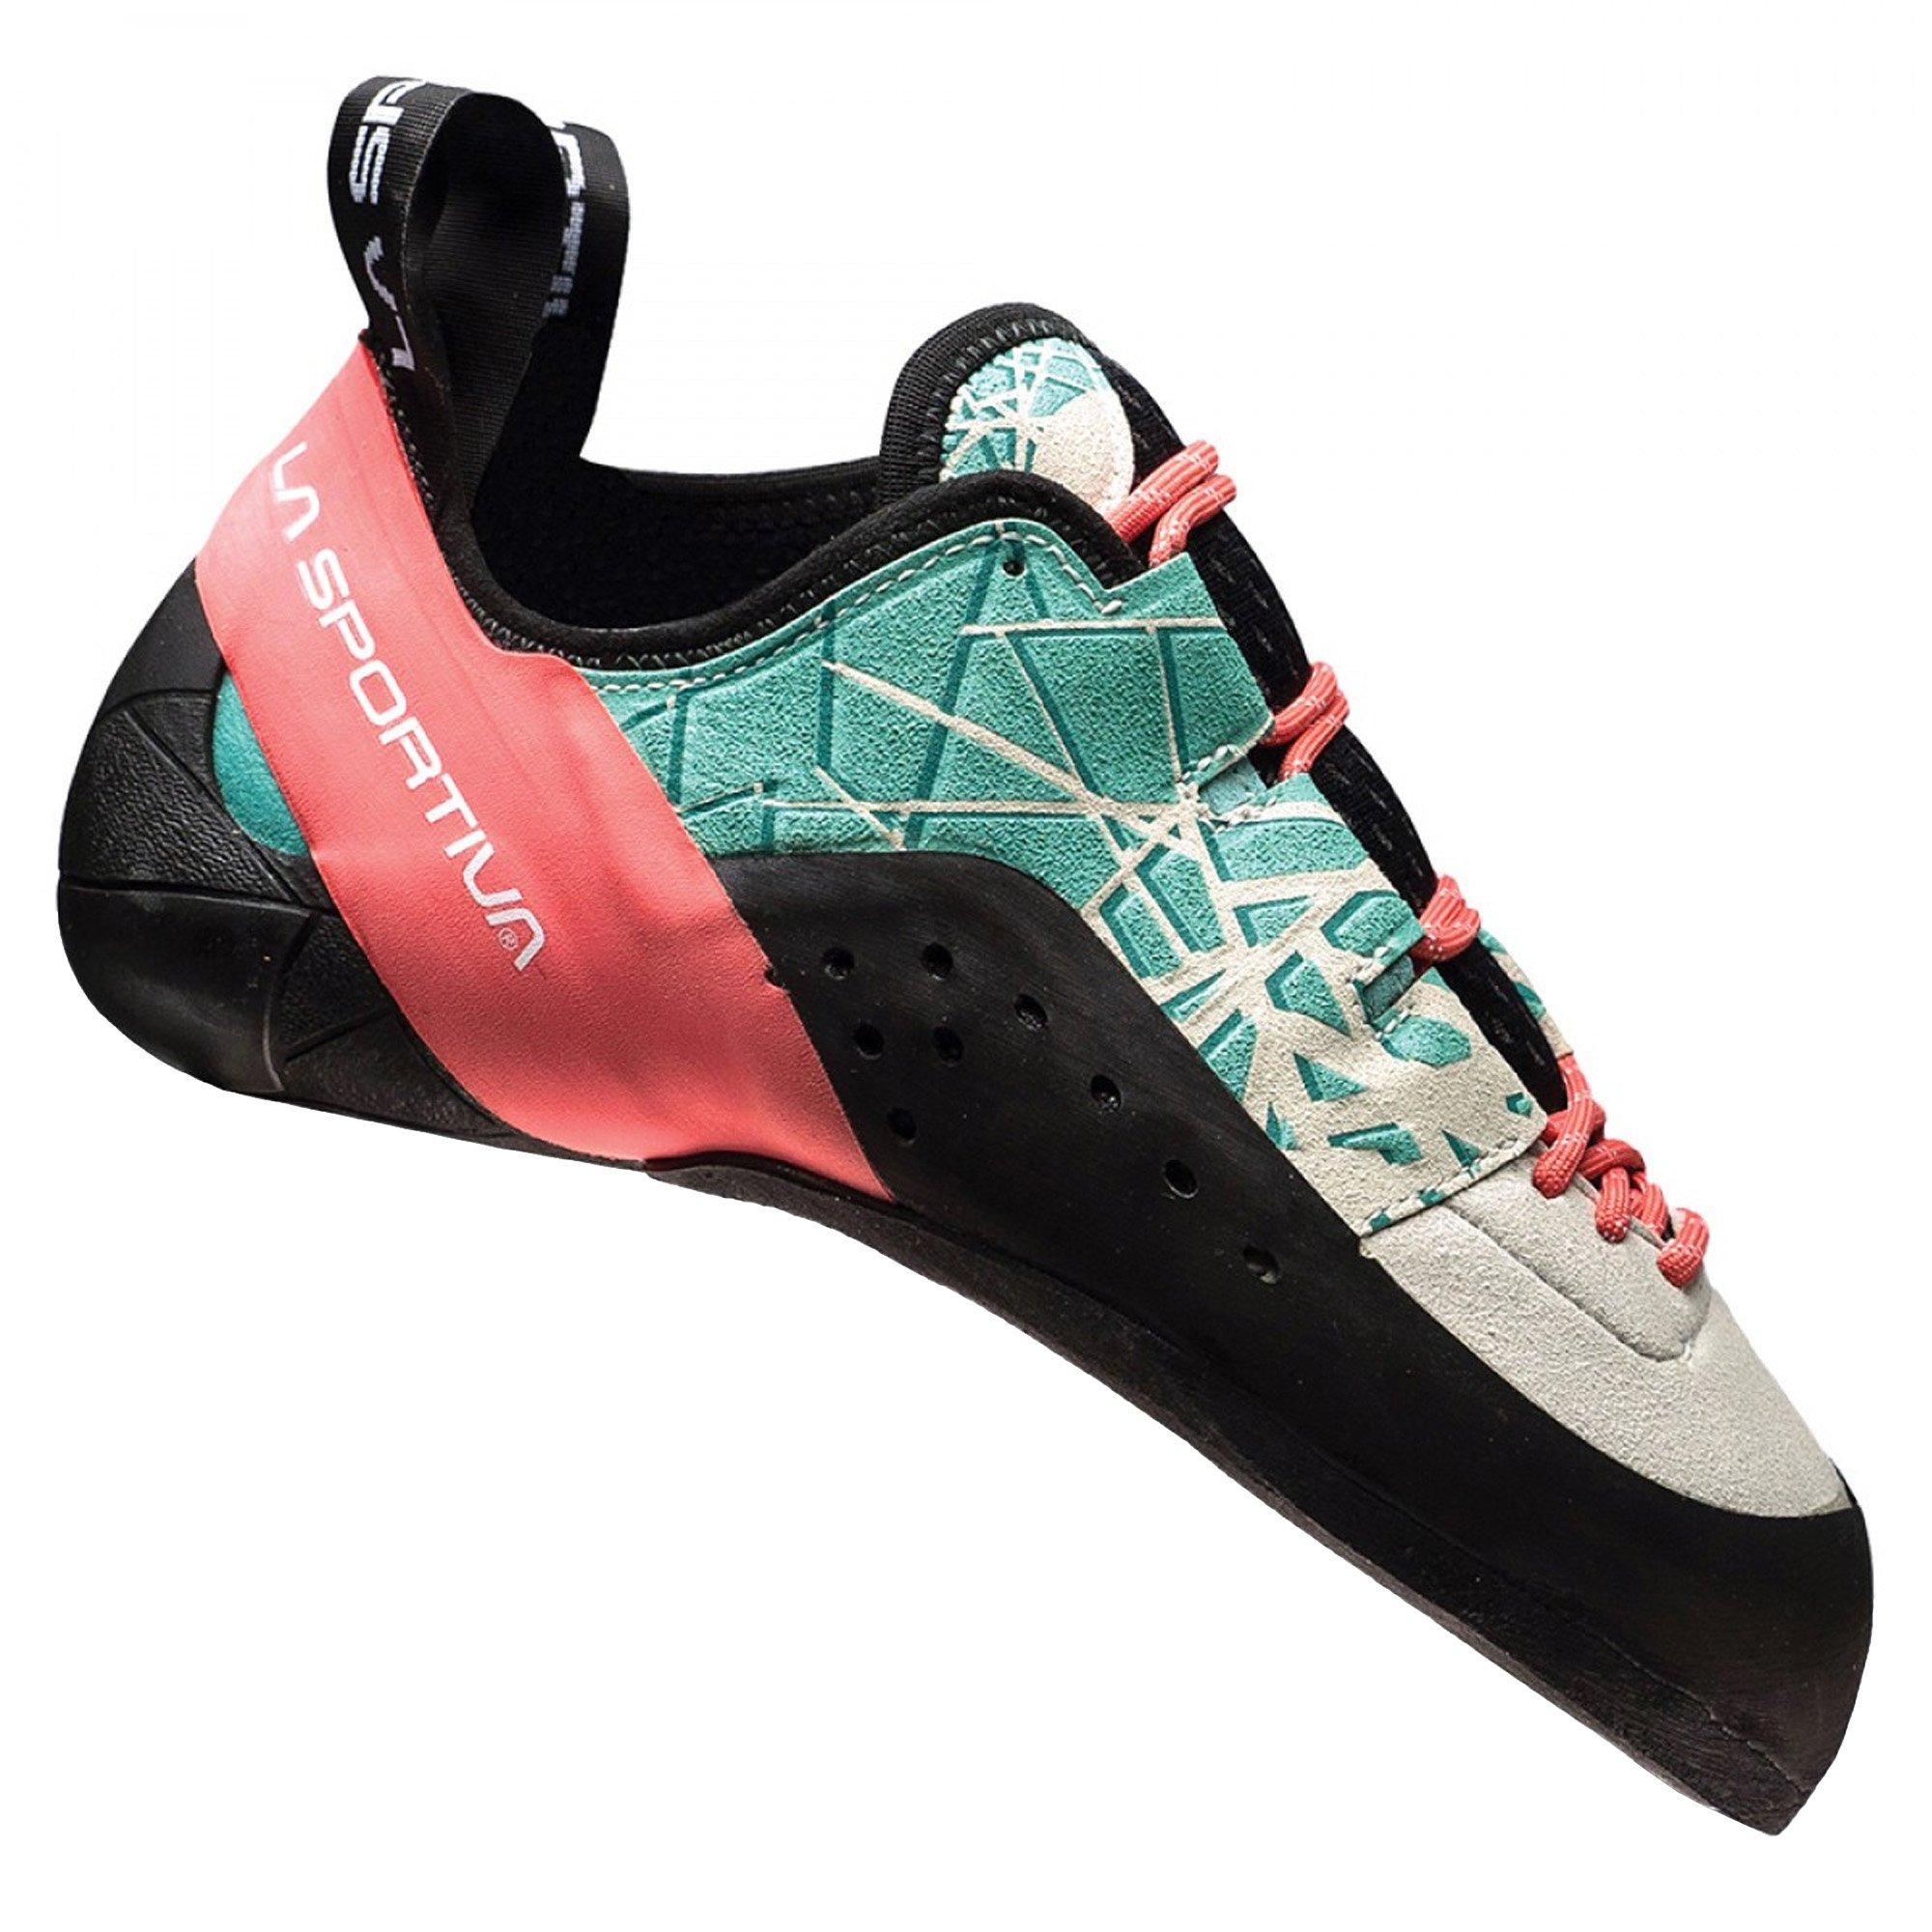 La Sportiva Kataki Climbing Shoe - Women's Mint / Coral 41